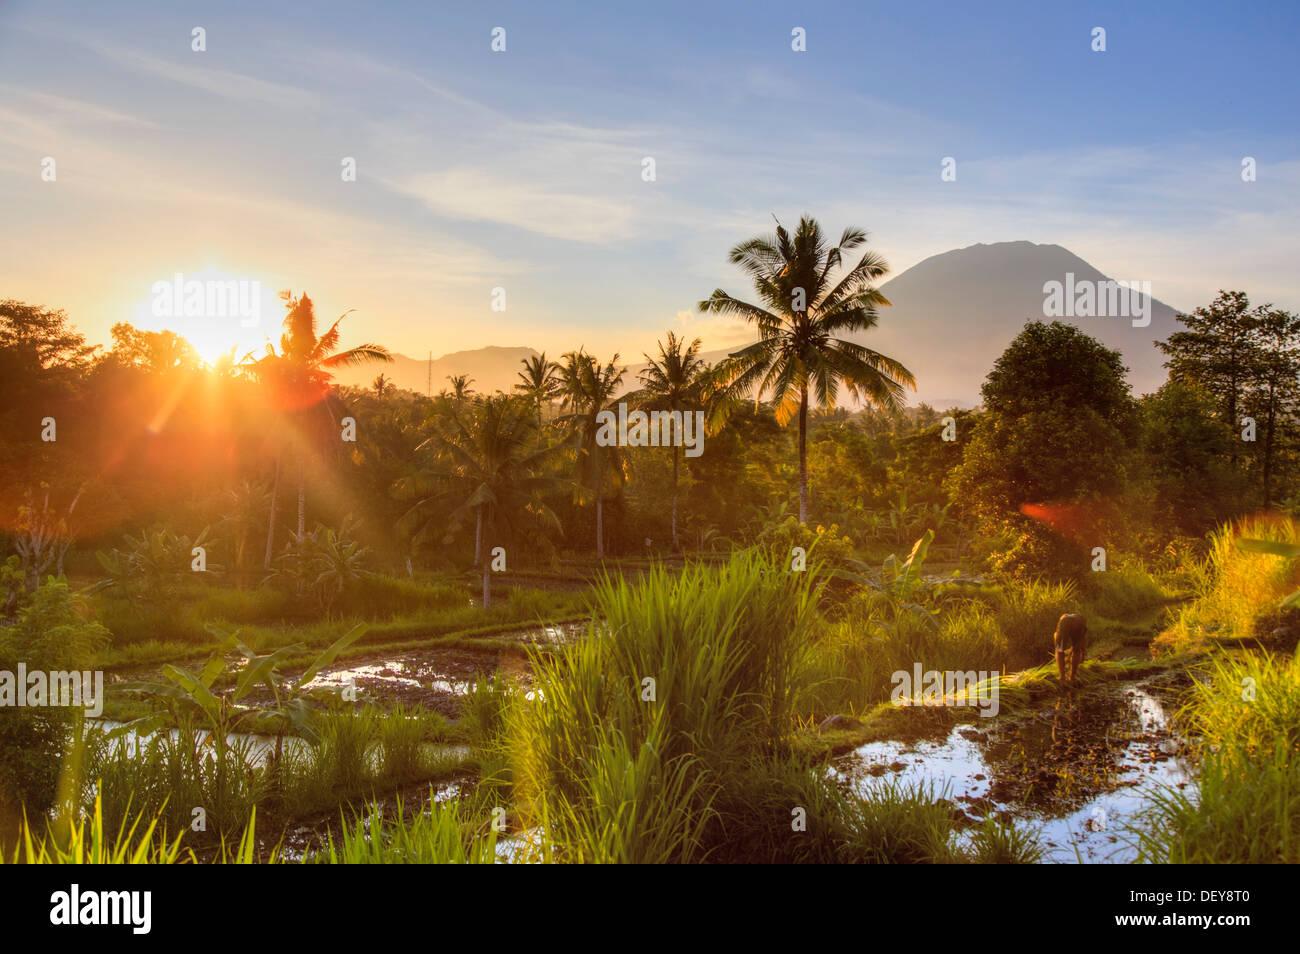 Indonesia, Bali, East Bali, Amlapura, Rice Fields and Gunung Agung Volcano - Stock Image